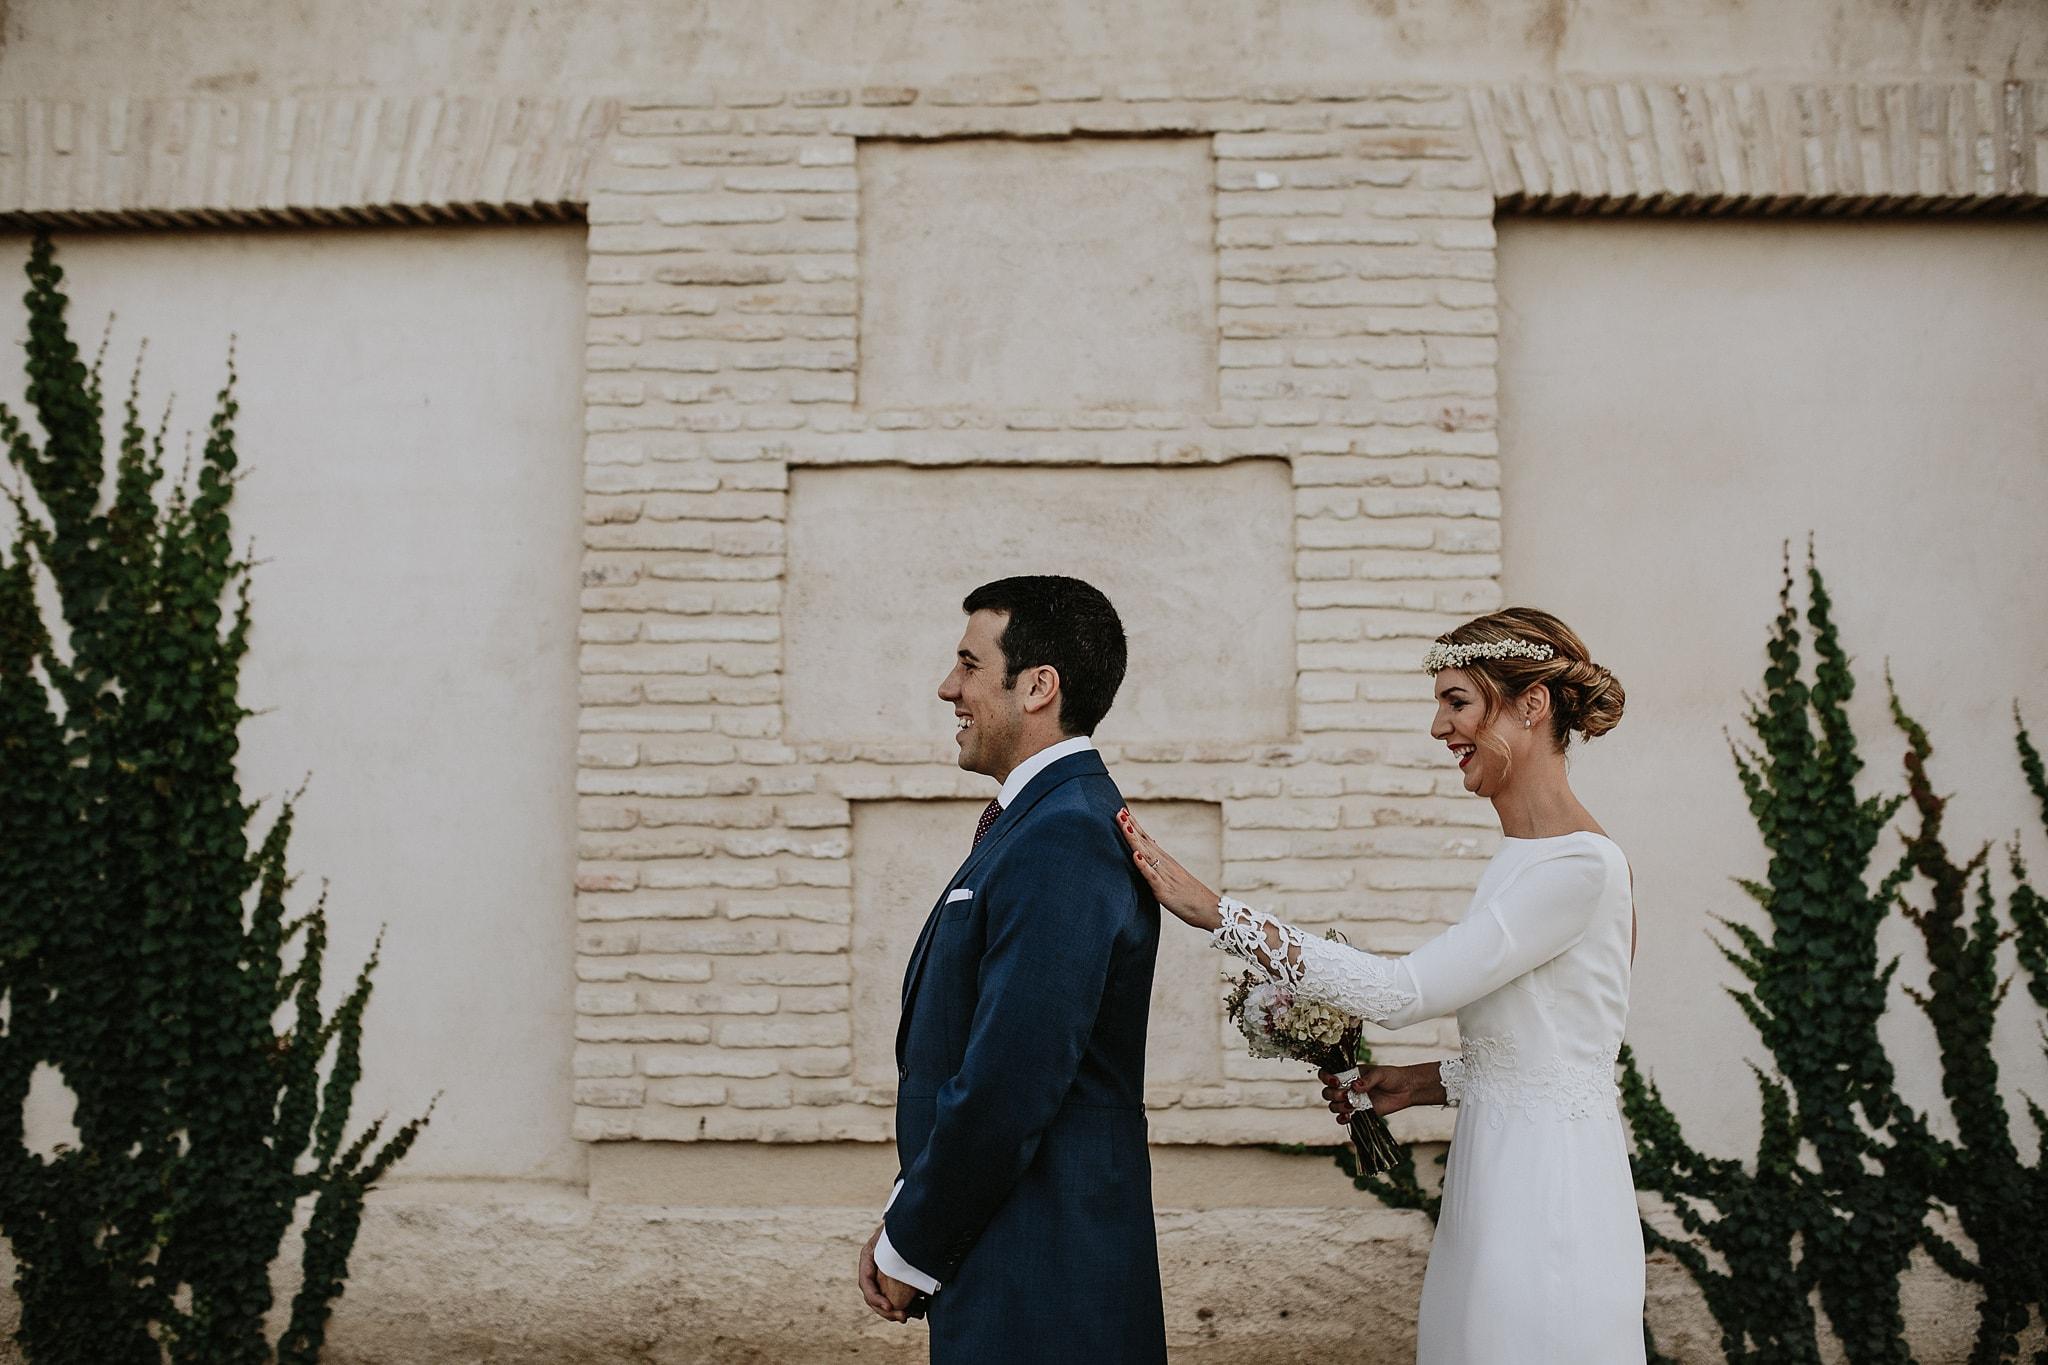 prisma-blanco-fotografos-bodas-toledo-63